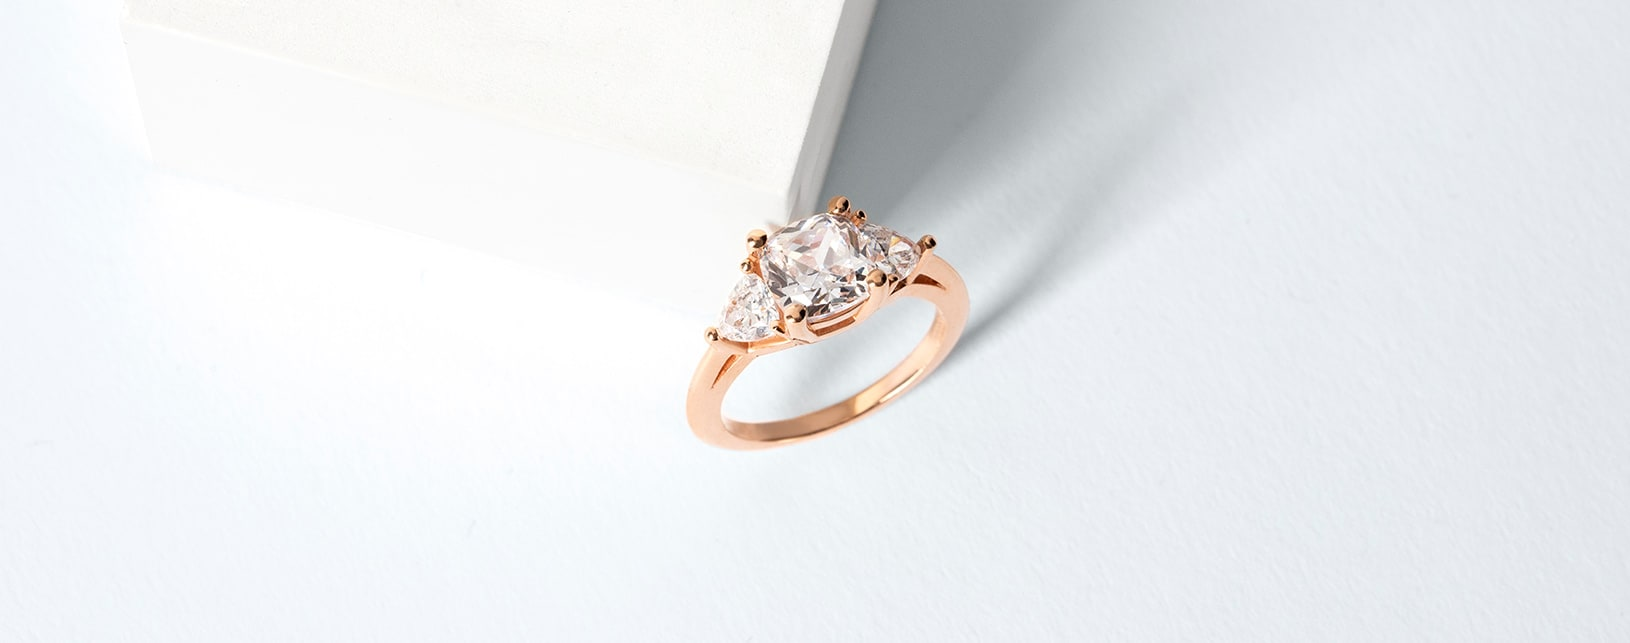 A classic three stone setting with a princess cut diamond alternative center stone